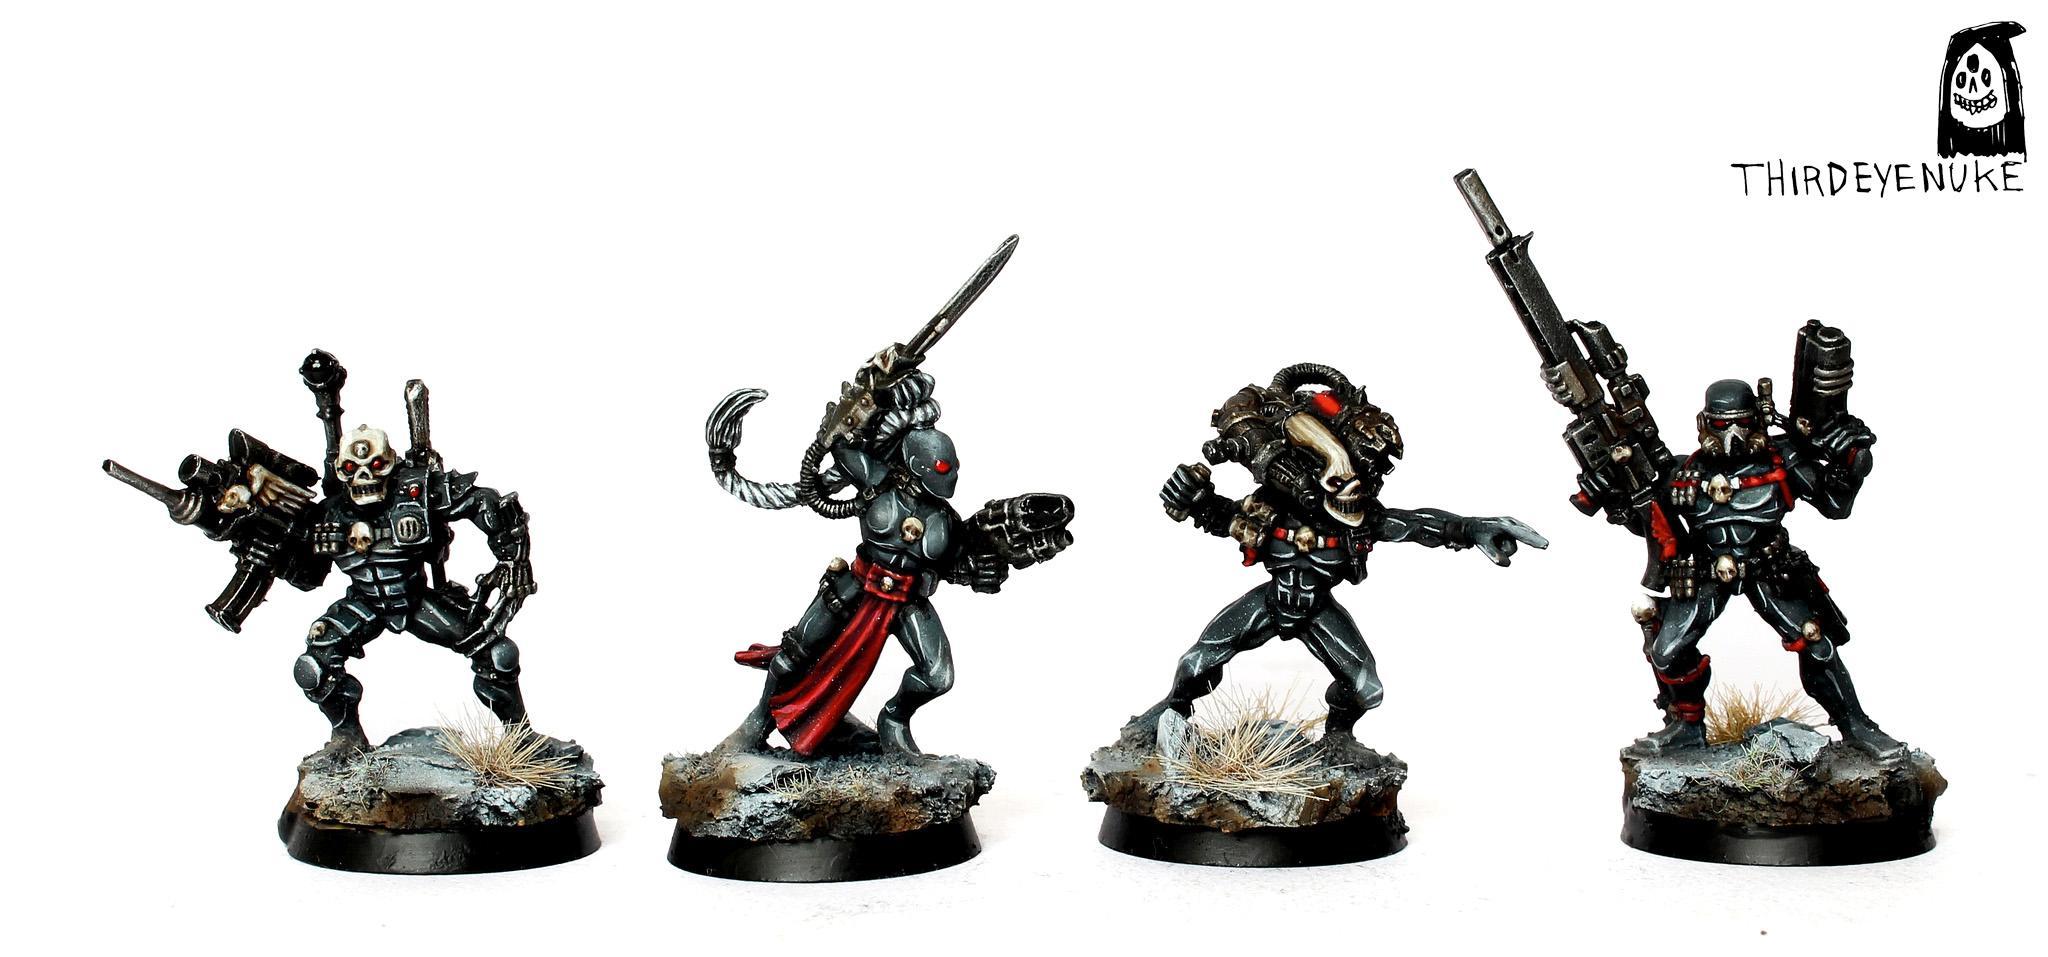 Assassin, Callidus, Culexus, Eversor, Officio Assassinorum, Thirdeyenuke, Vindicare, Warhammer 40,000